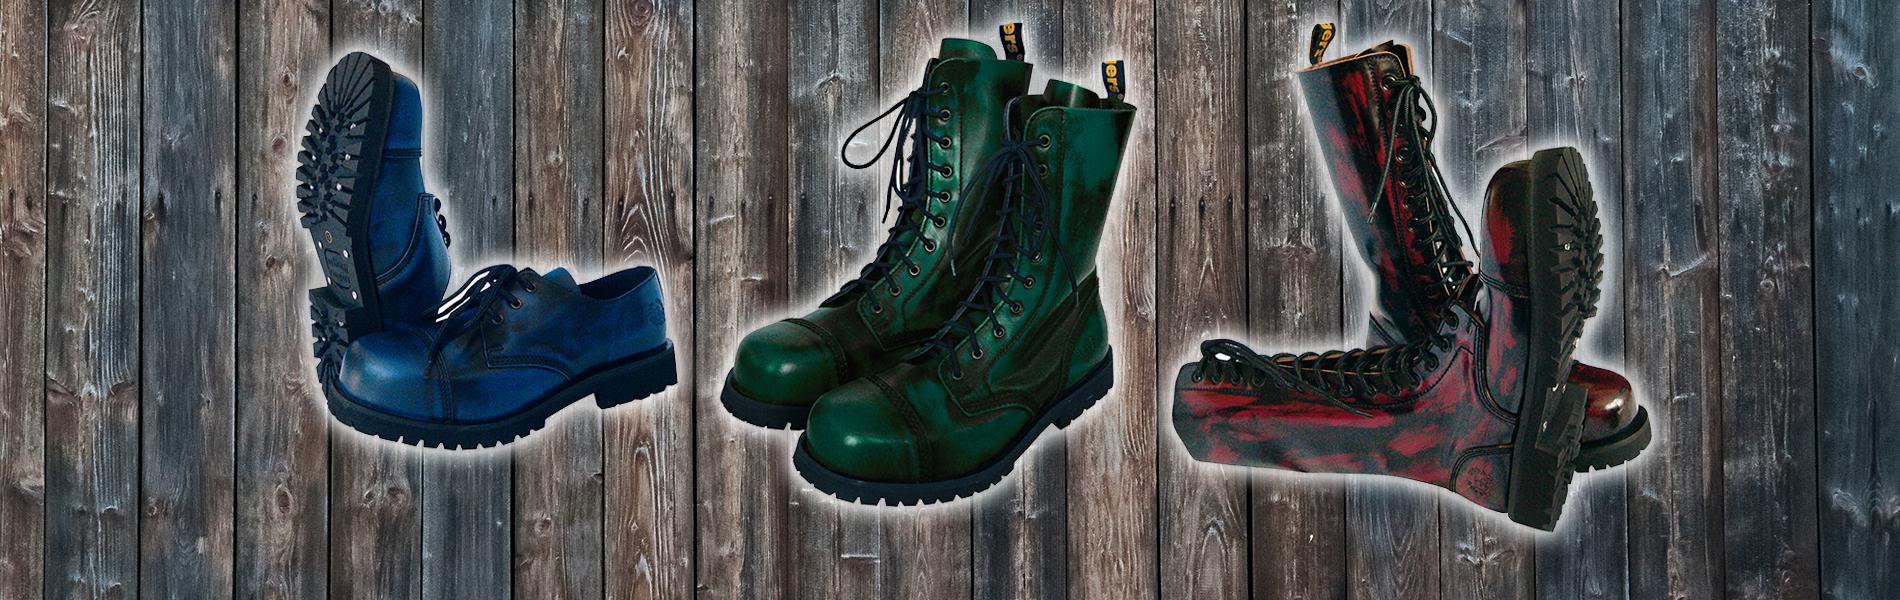 Urban Ranger Boots jetzt im Outlet